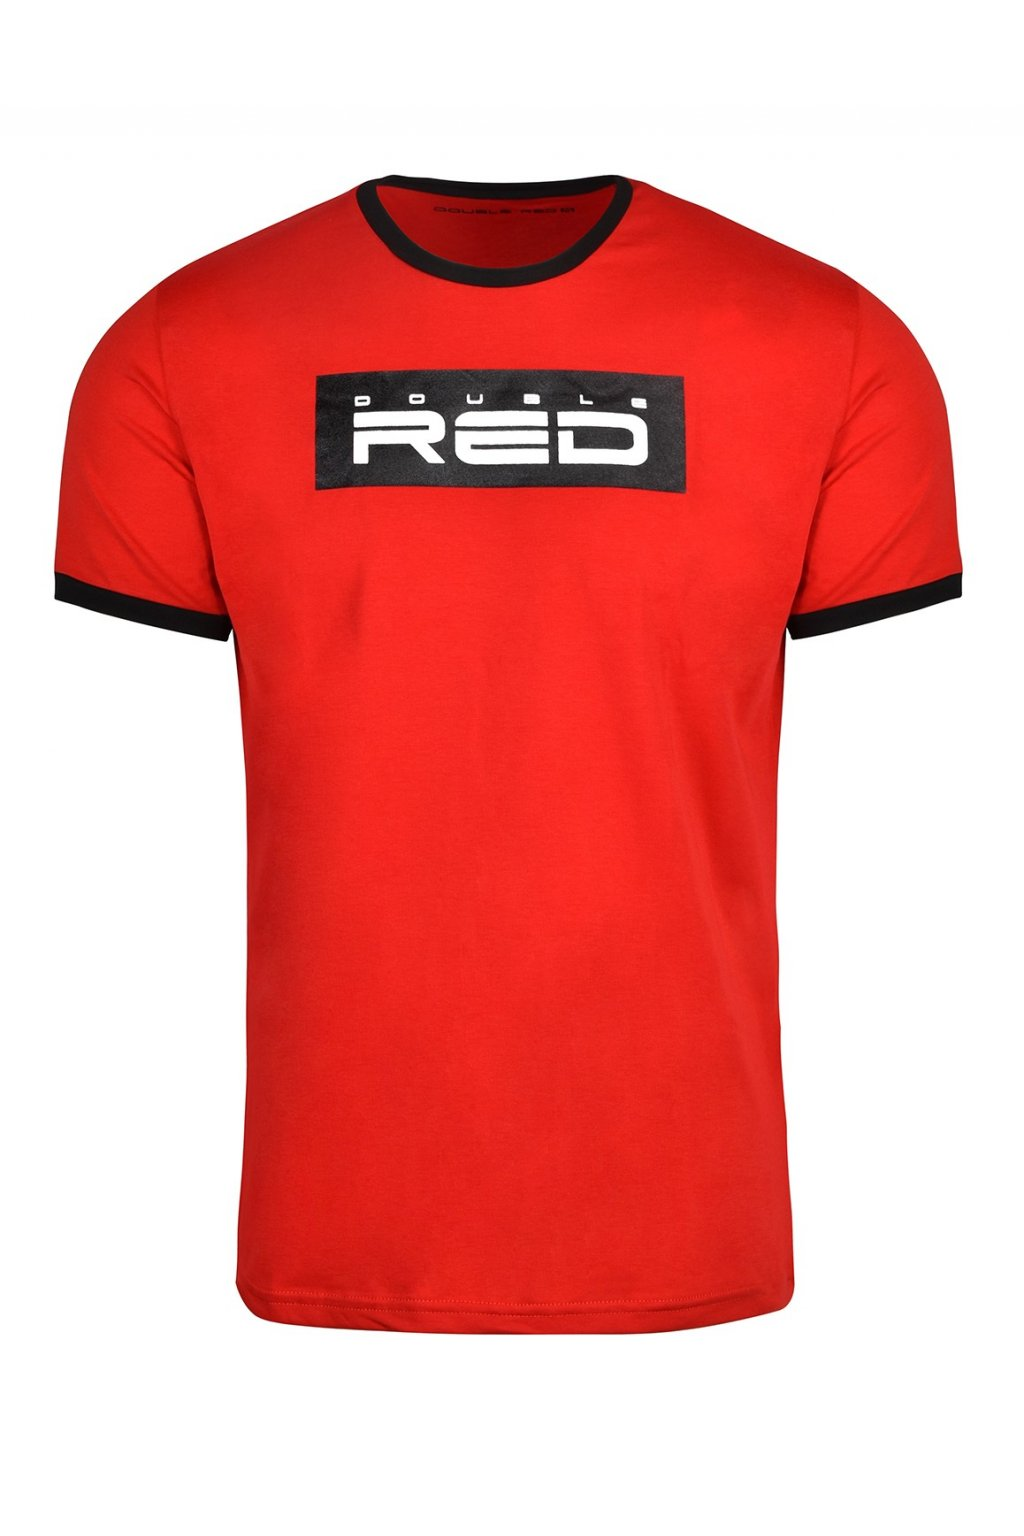 t shirt logo vision redblack